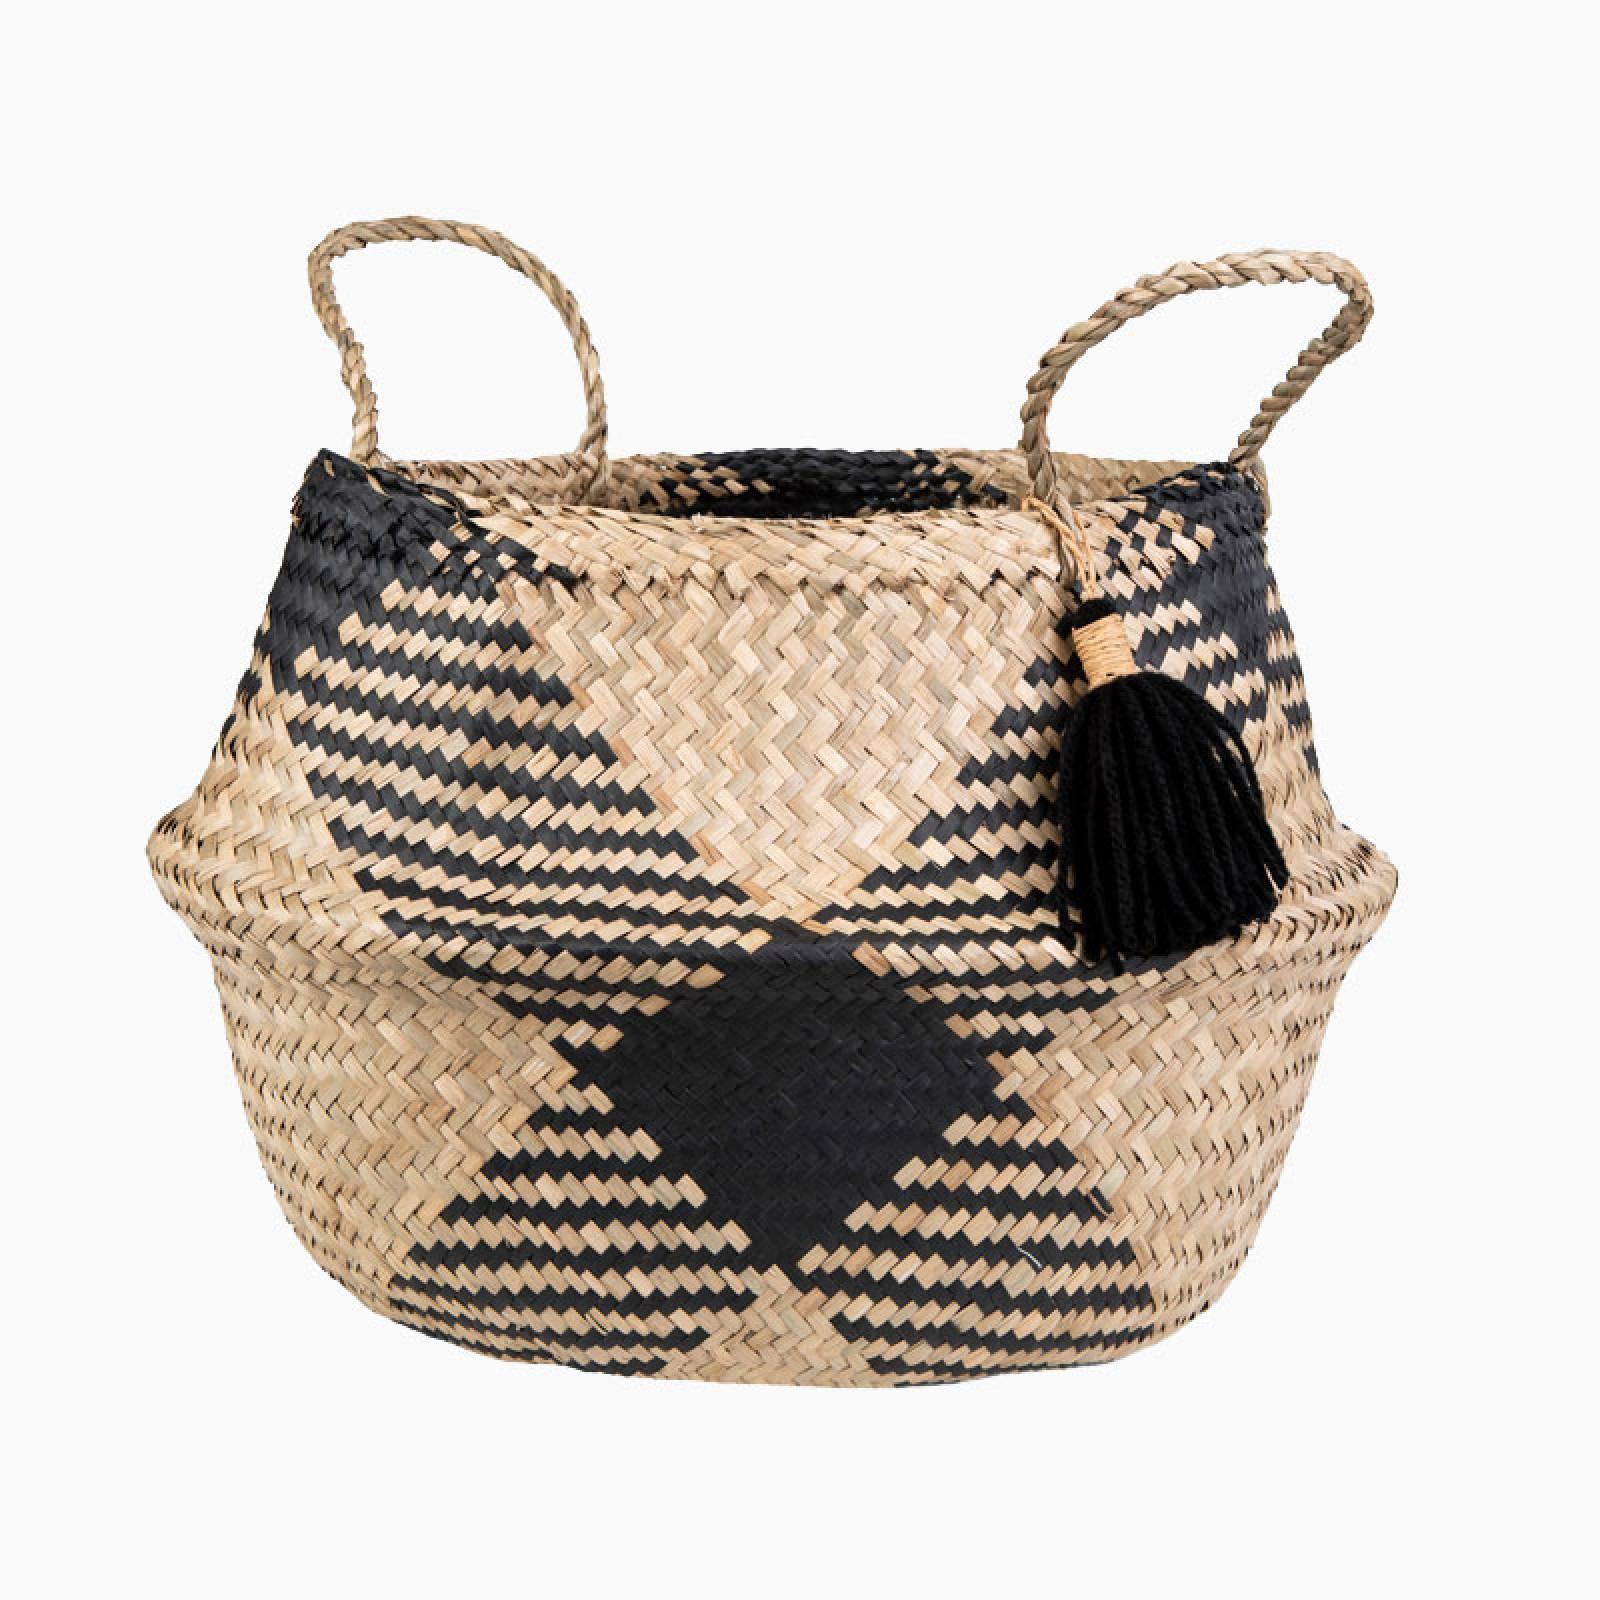 Black And Natural Seagrass Tassle Basket